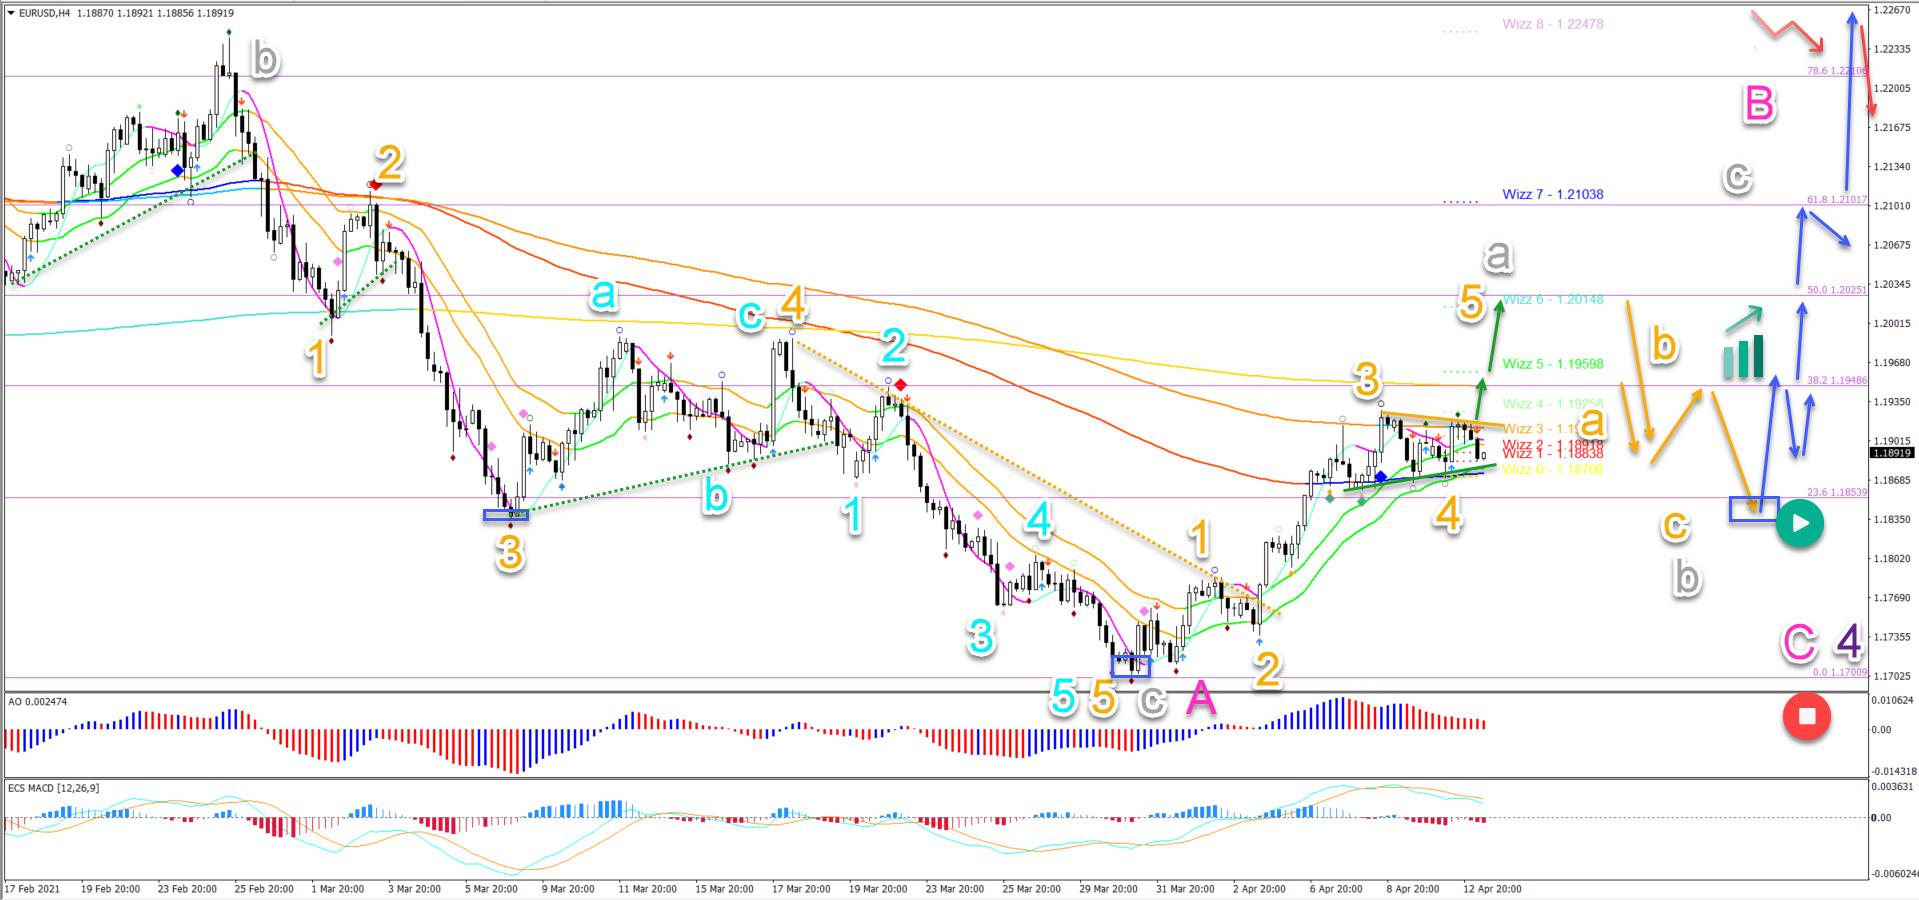 EUR/USD 13.04.2021 4 hour chart